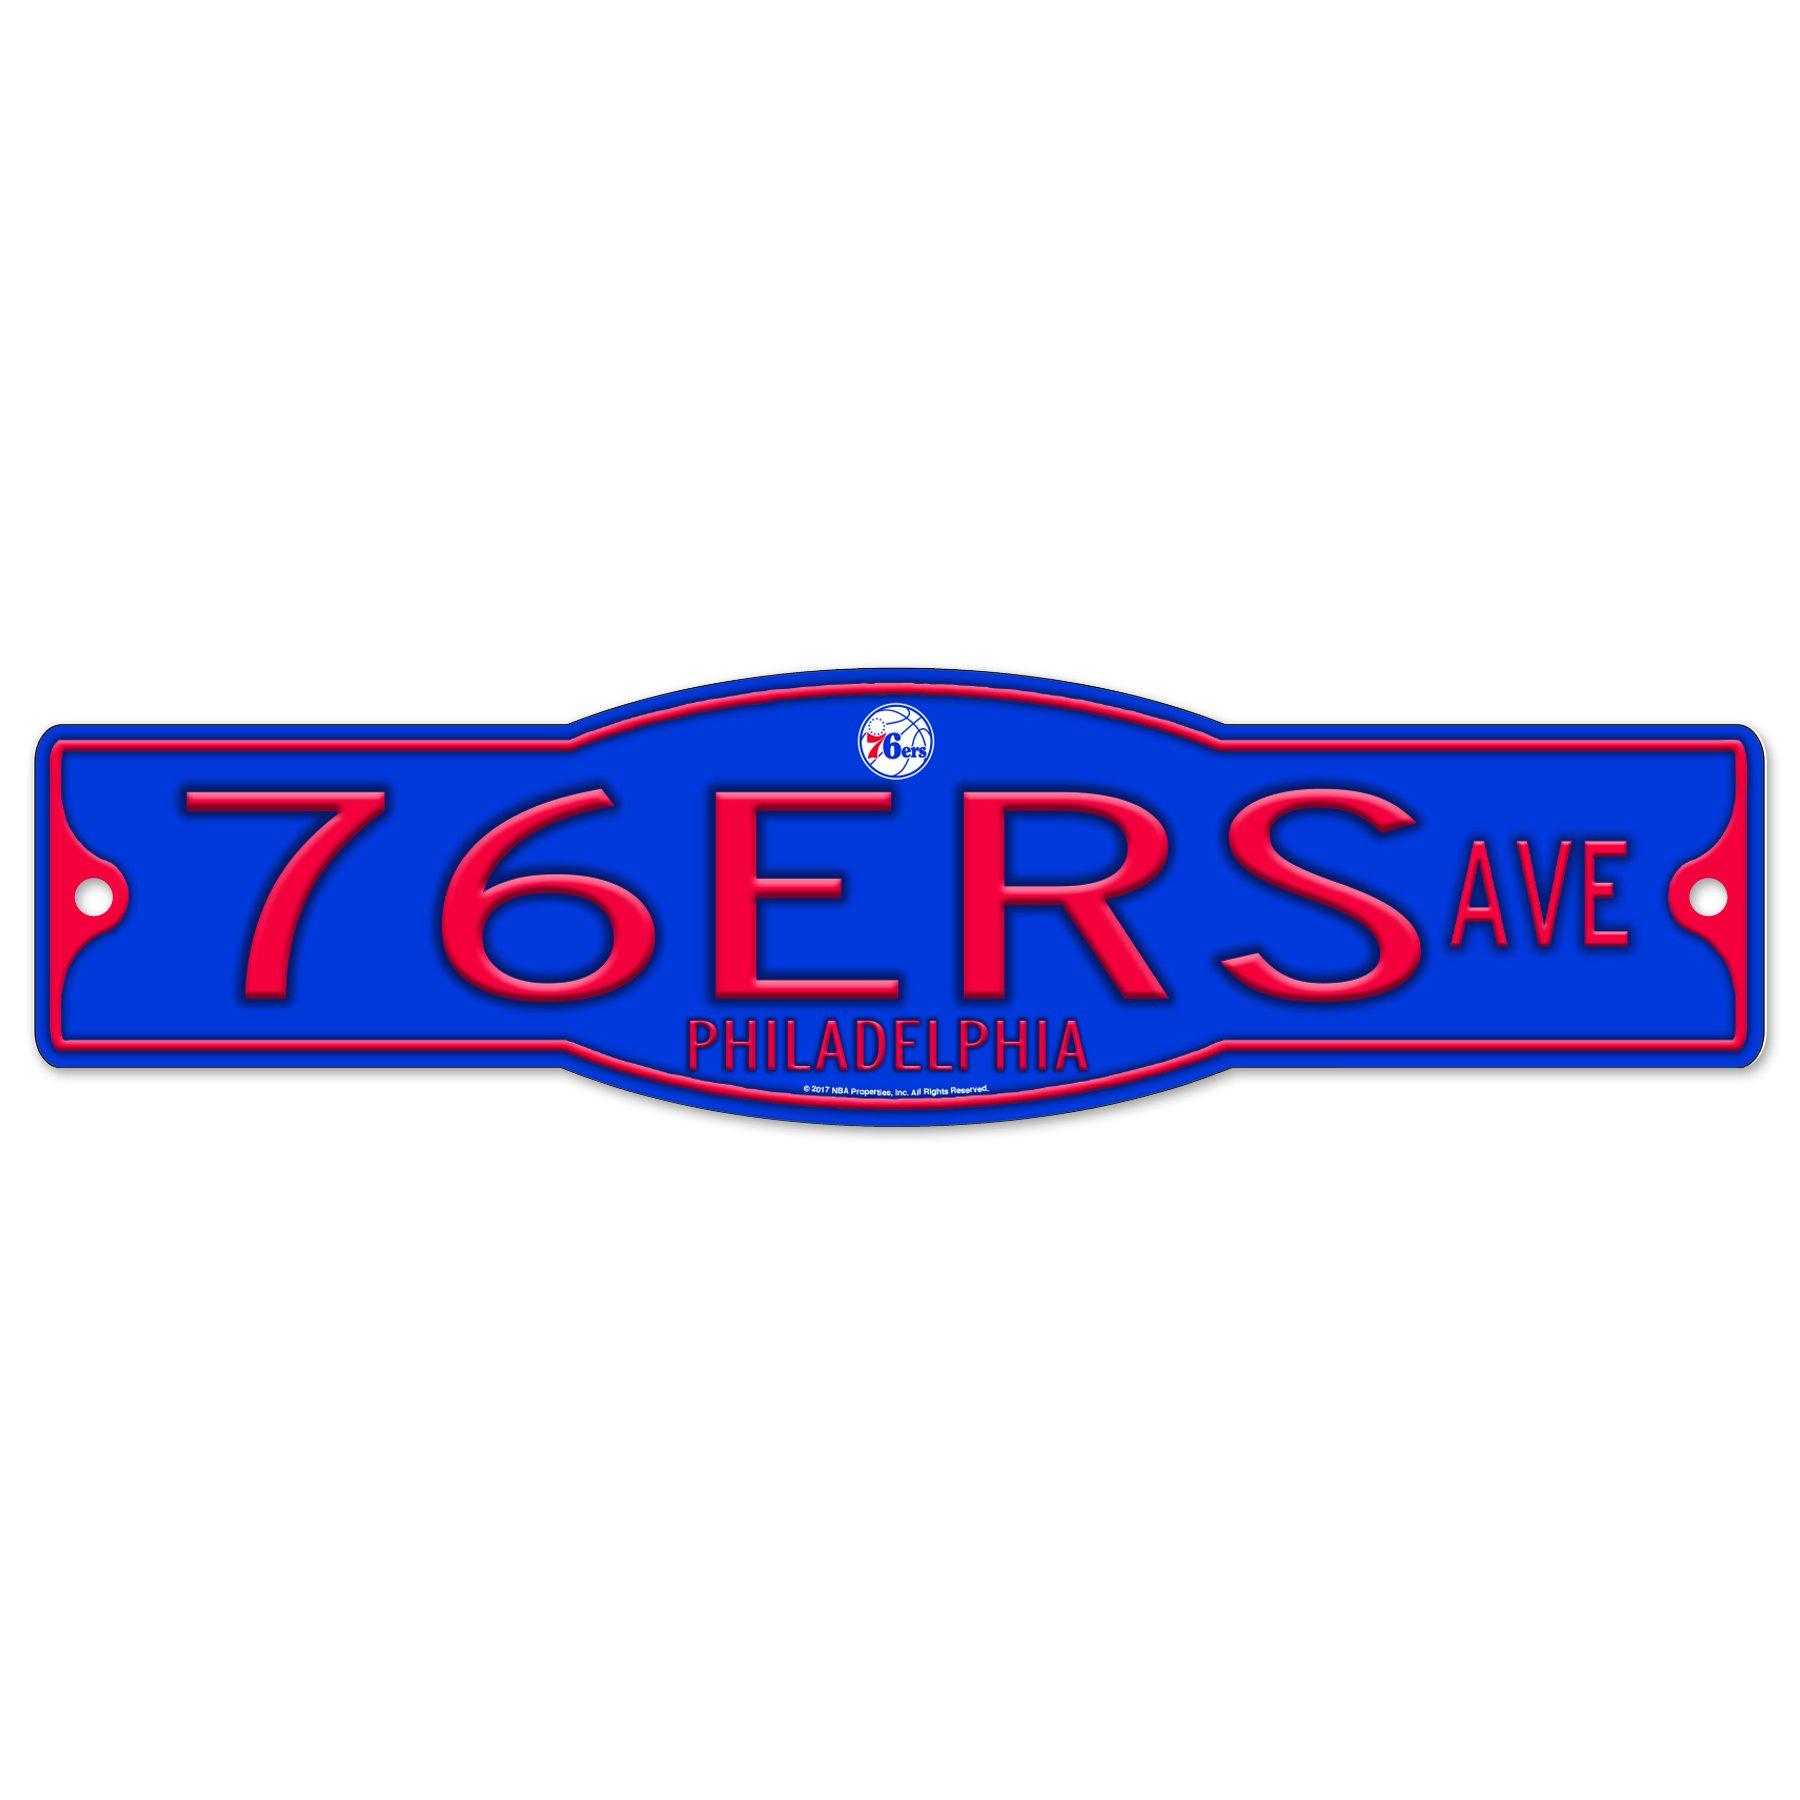 Philadelphia 76ers NBA Basketball Plastic 4 x 17 Street Sign